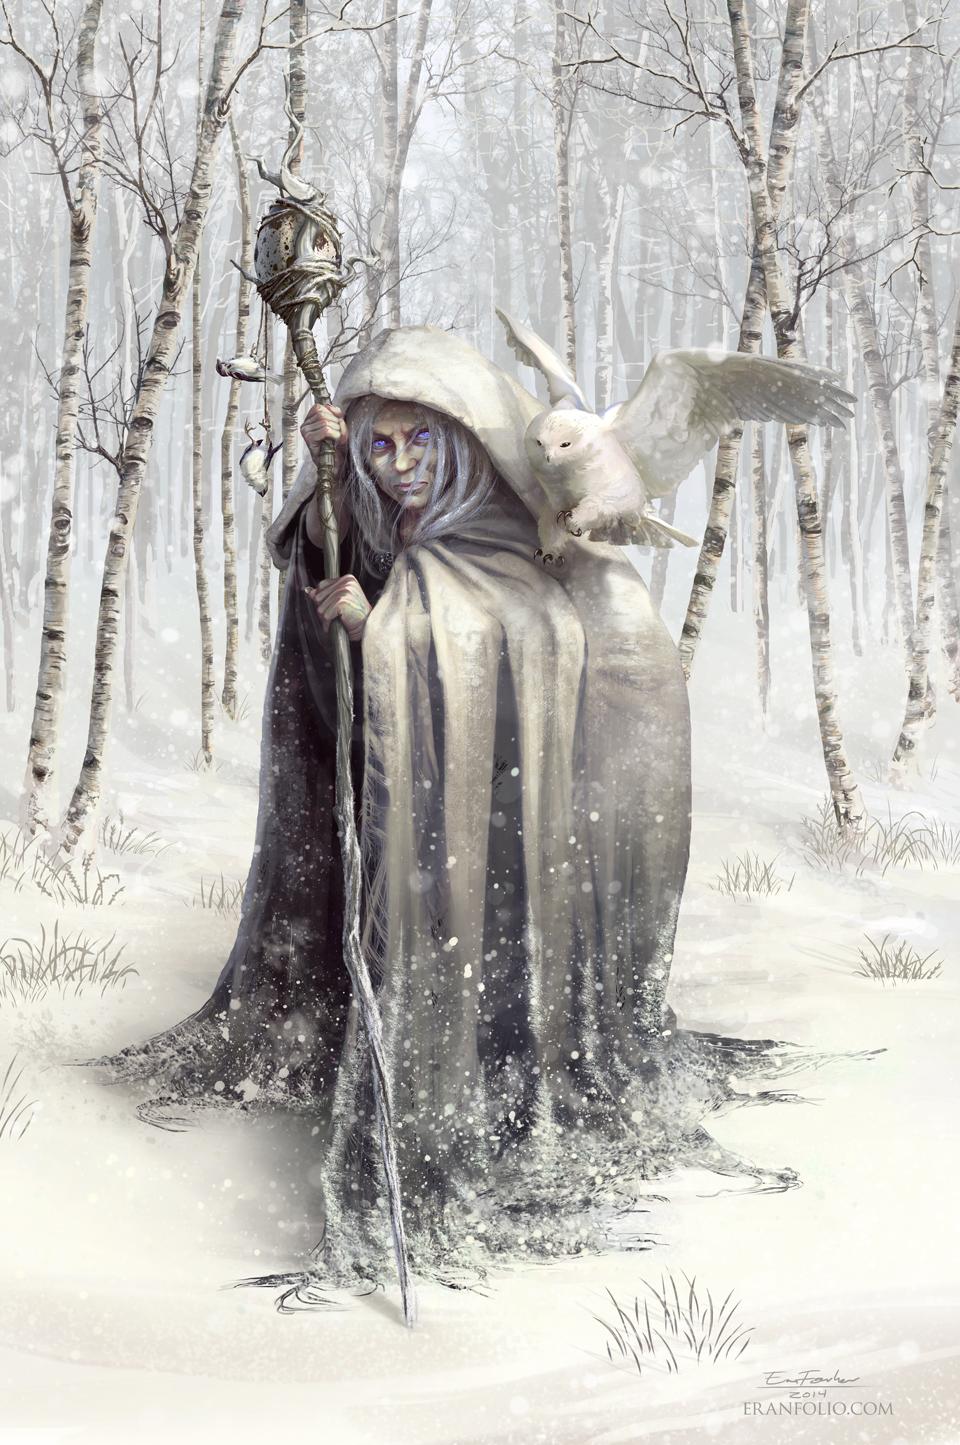 Иллюстрации Eran Fowler